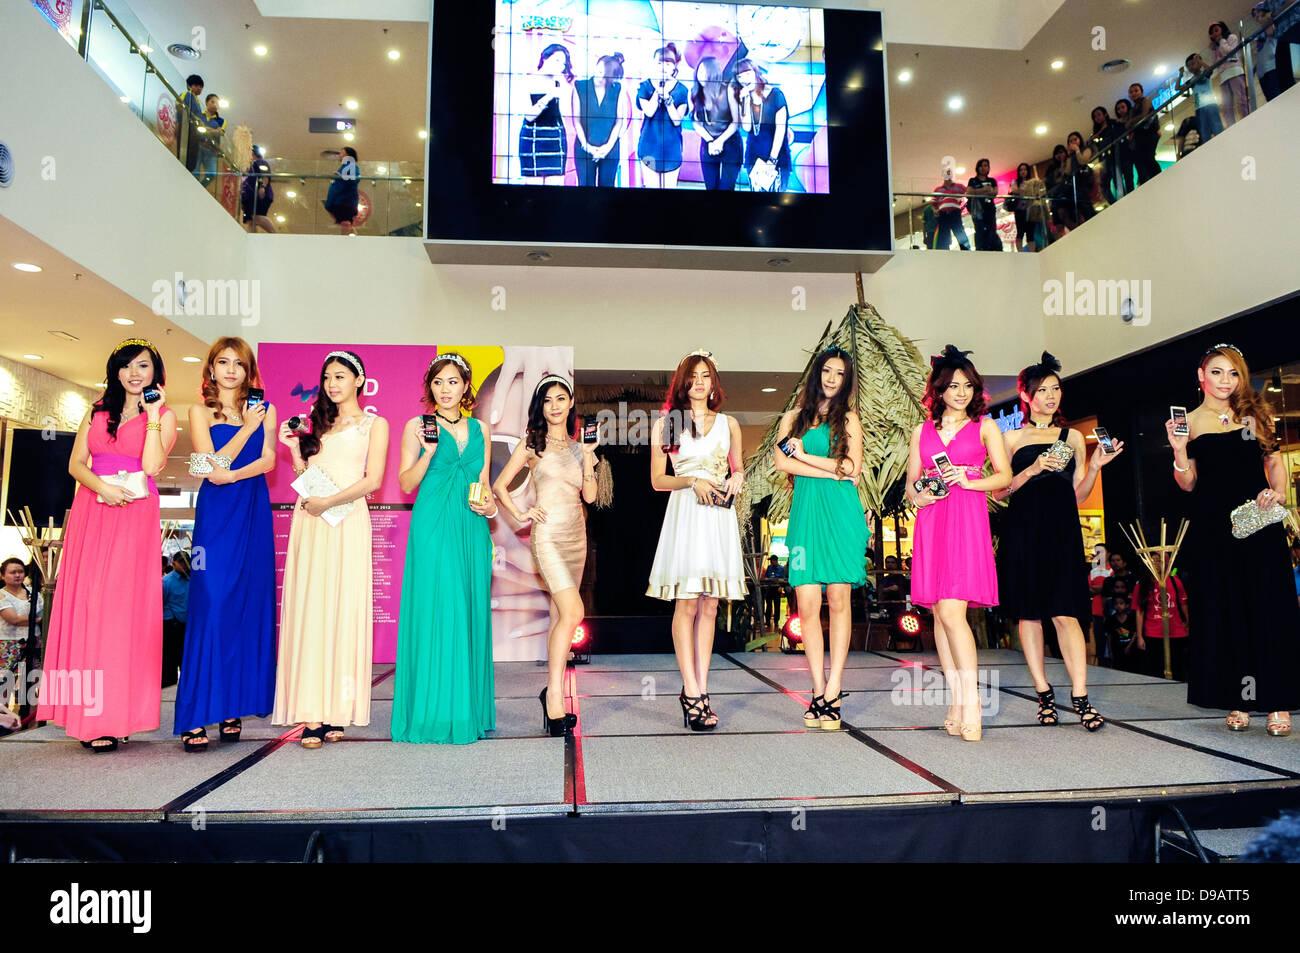 Models posing at Plaza Merdeka Fashion Week held on May 25, 2013 in Kuching, Malaysia - Stock Image